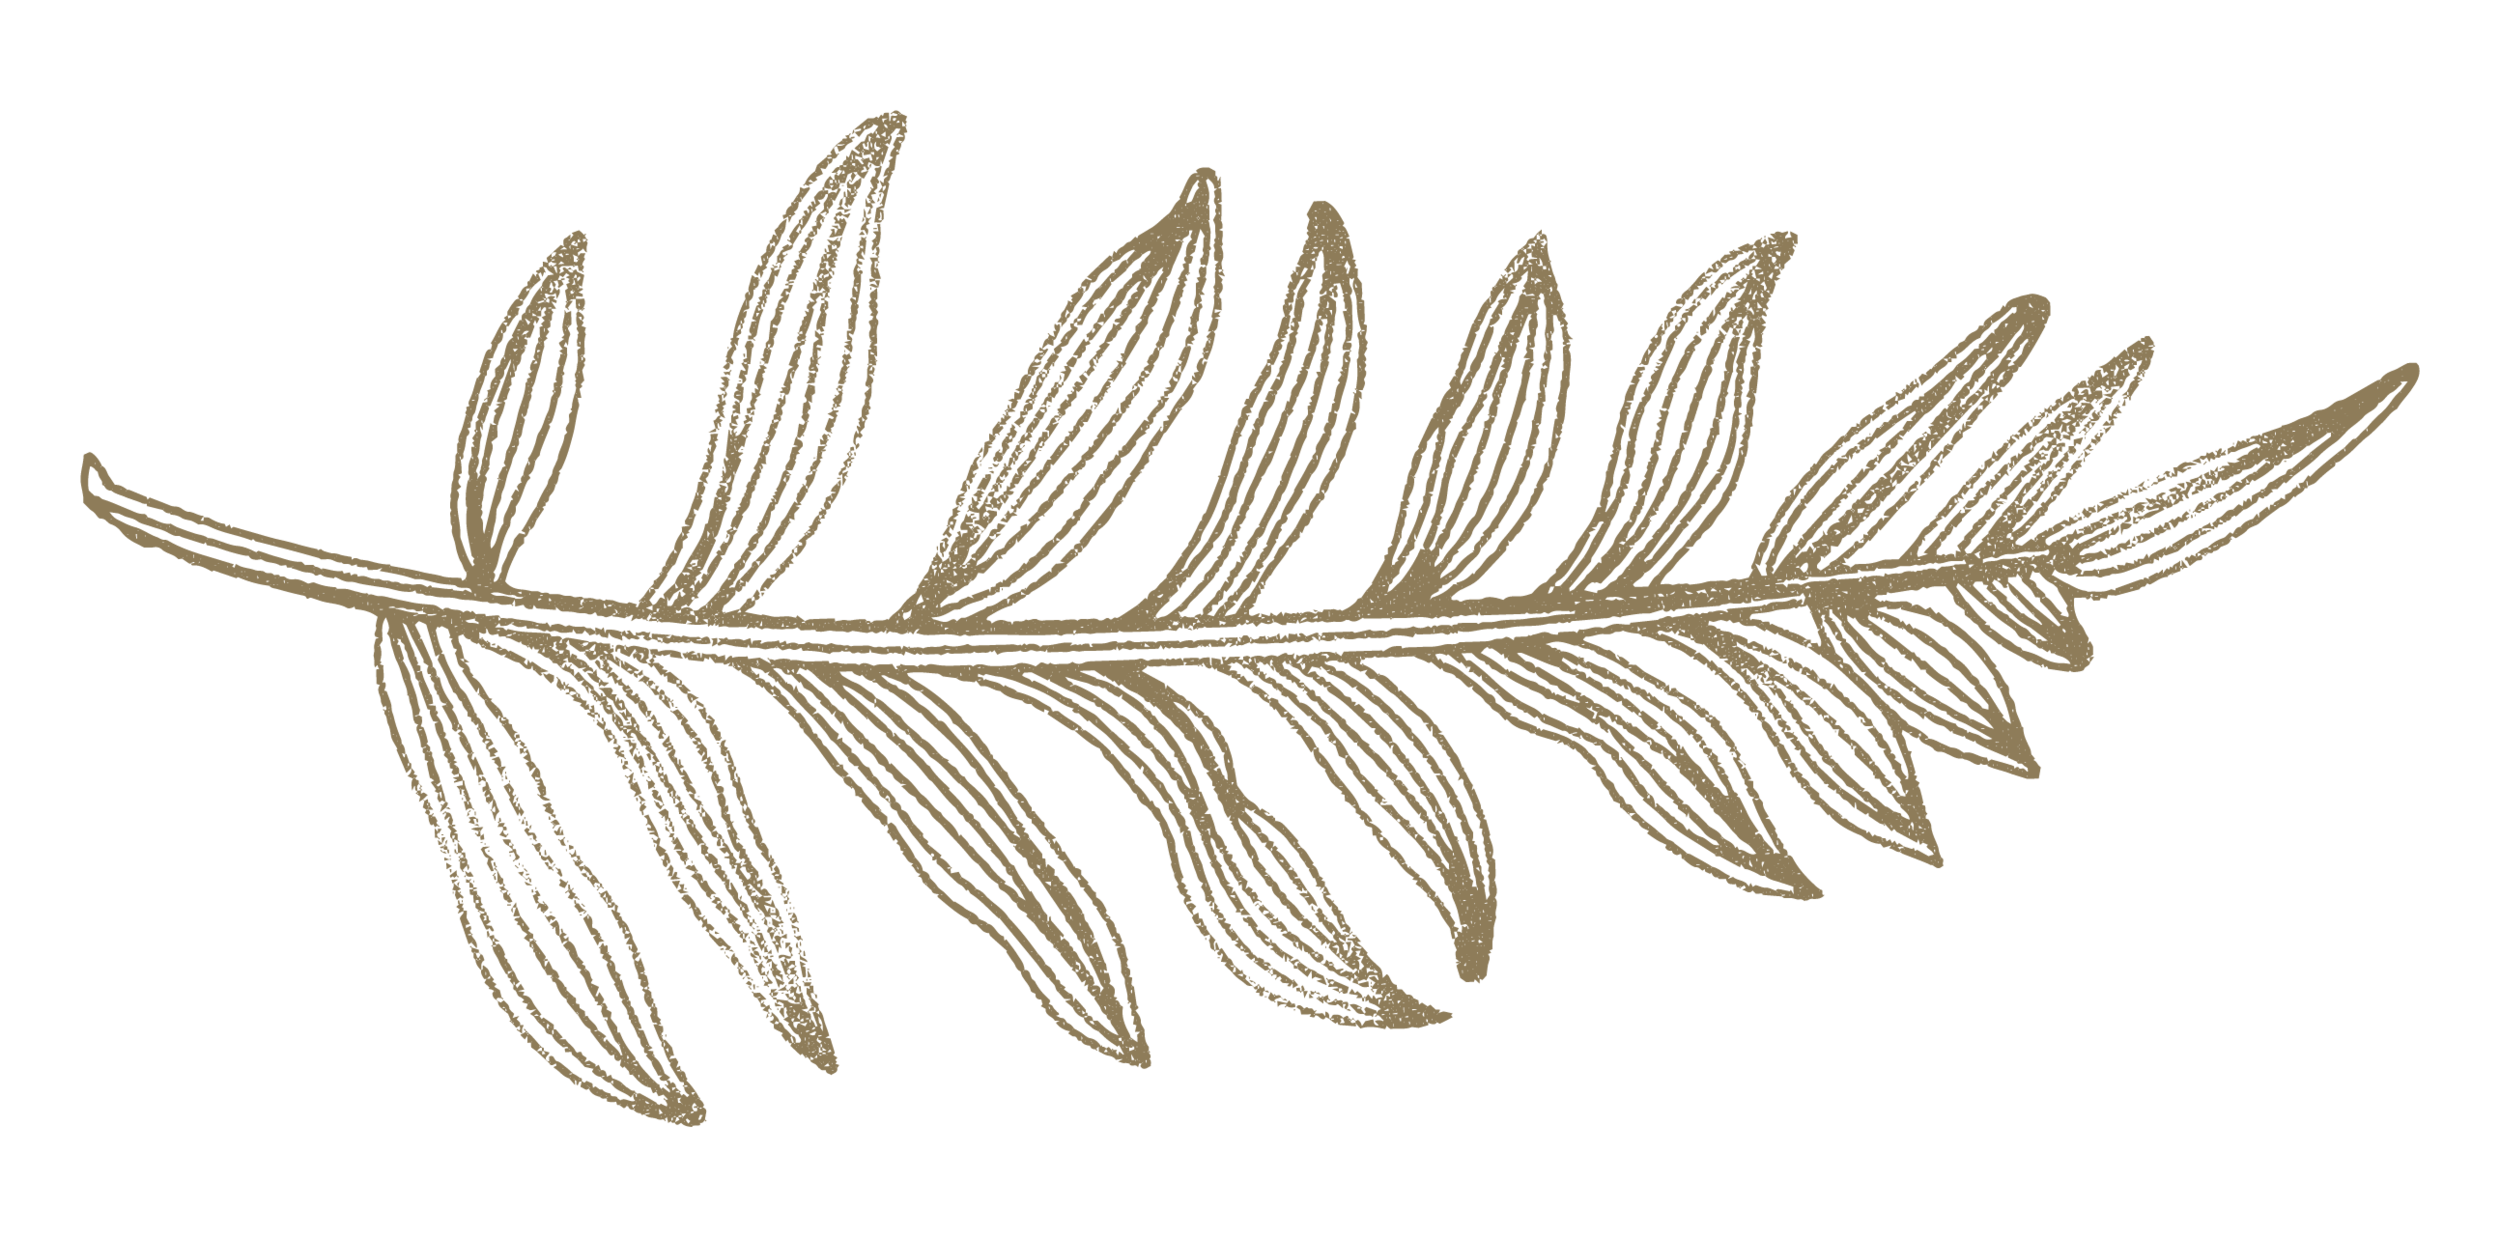 leaf-04.png